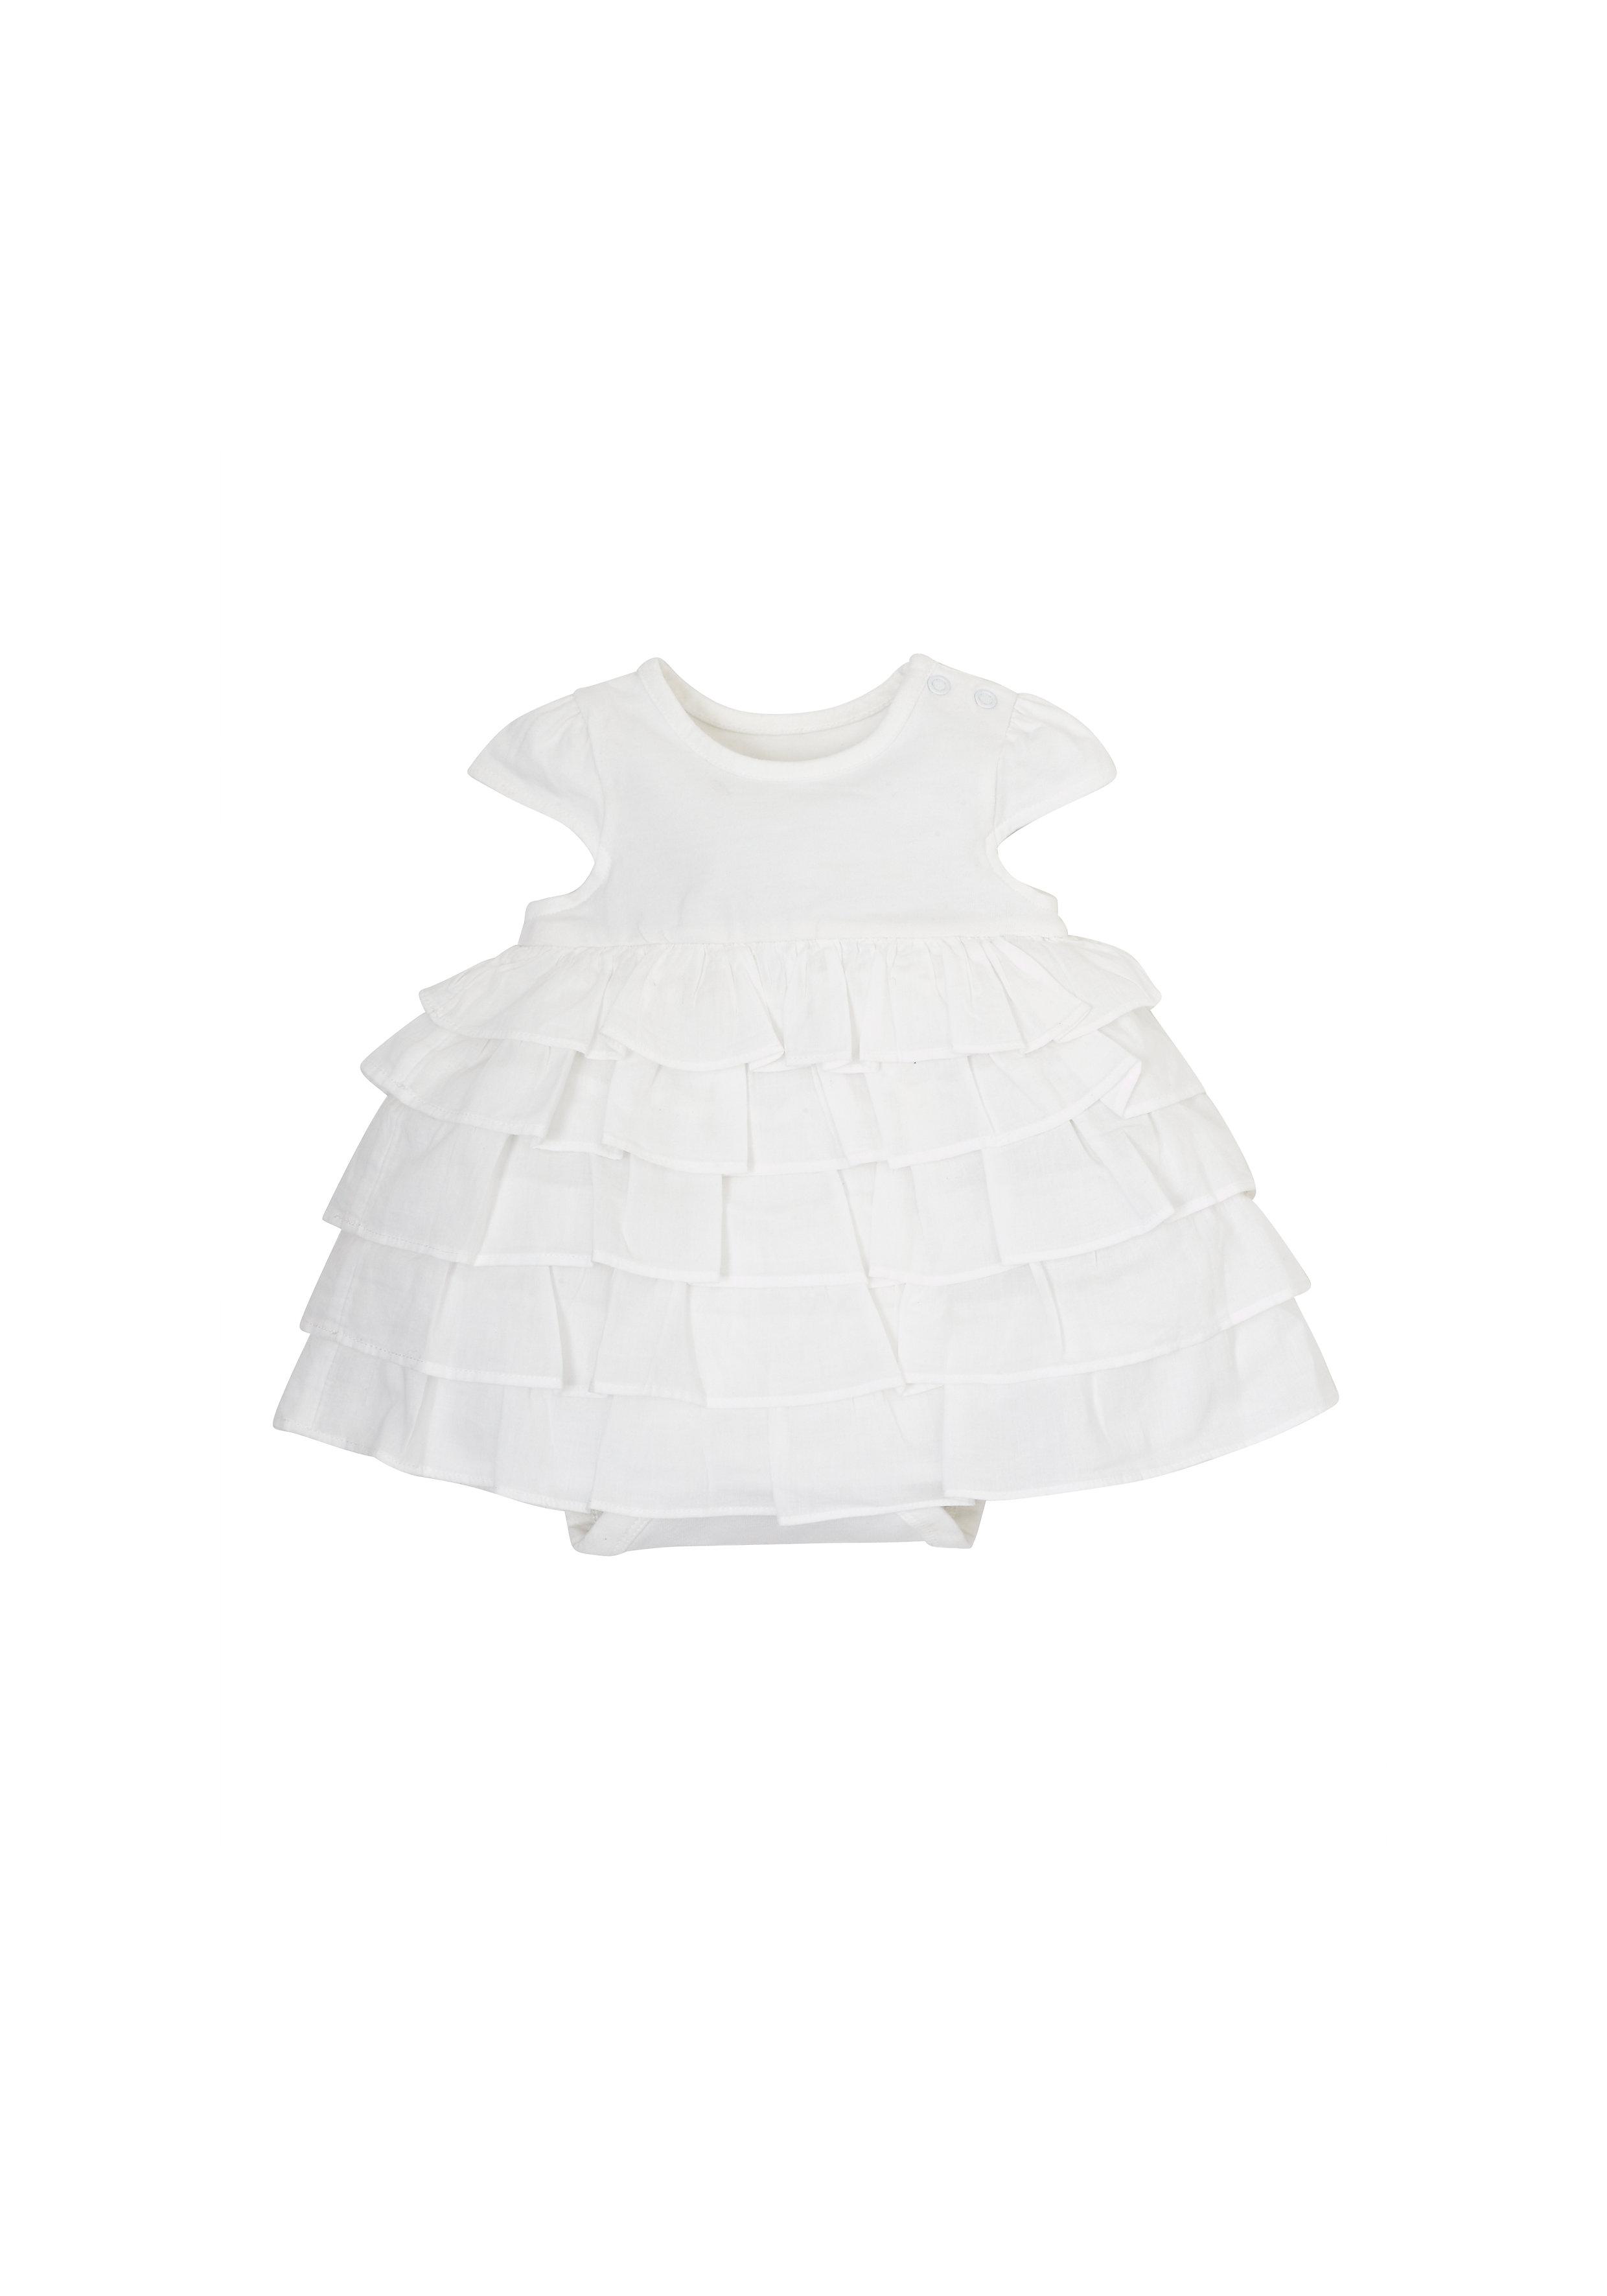 Mothercare | Girls Jersey Romper Dress - White